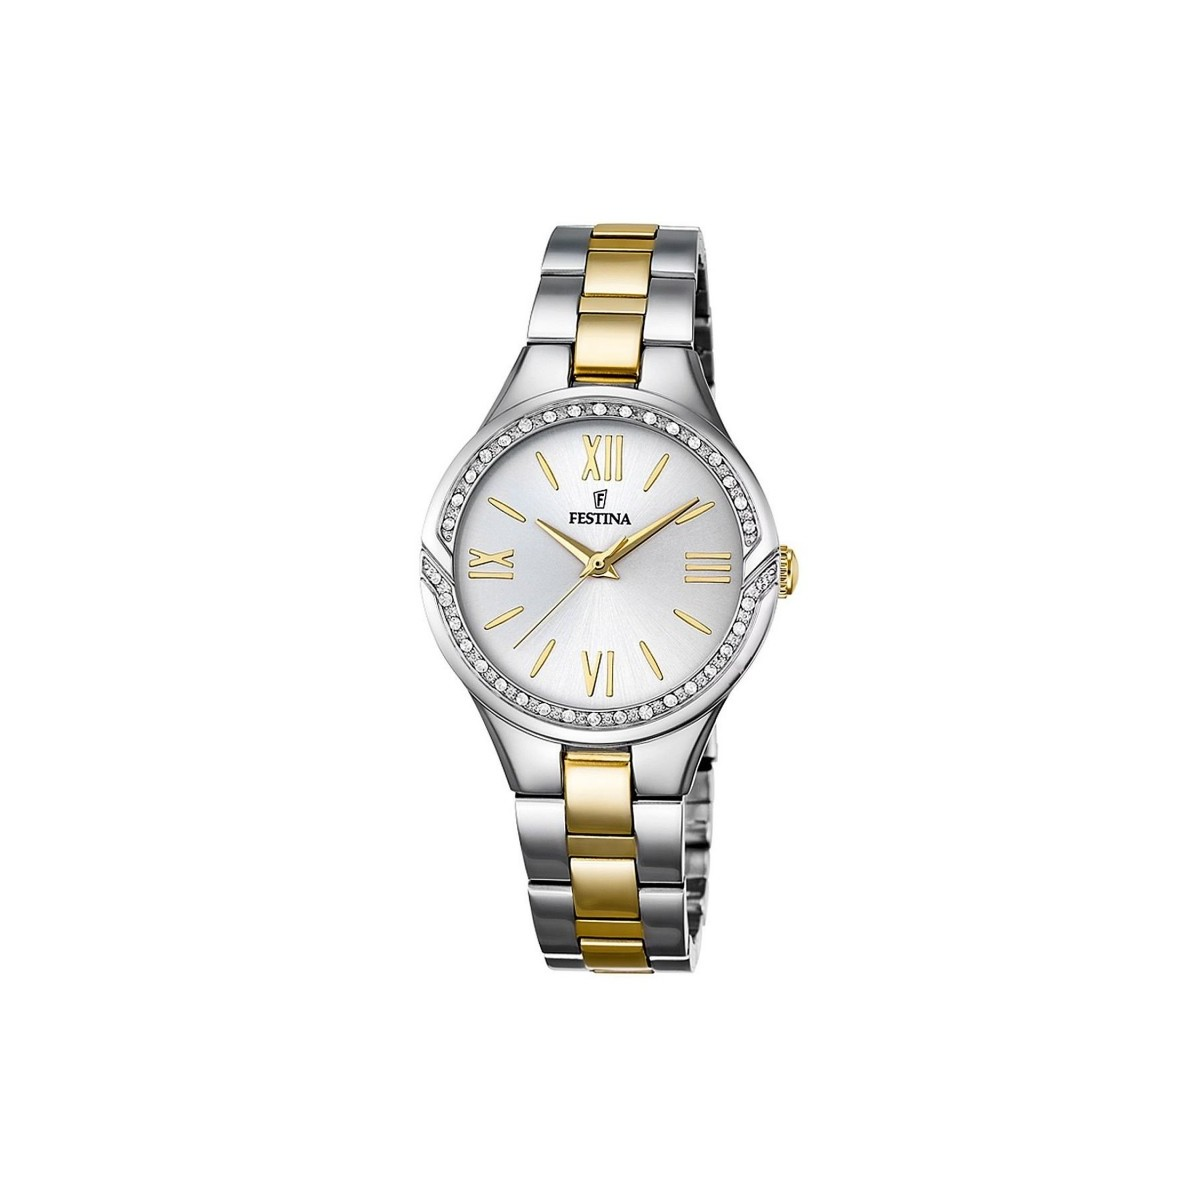 https://www.gaberjoyeria.com/3339-thickbox_default/reloj-festina-f16918-1.jpg